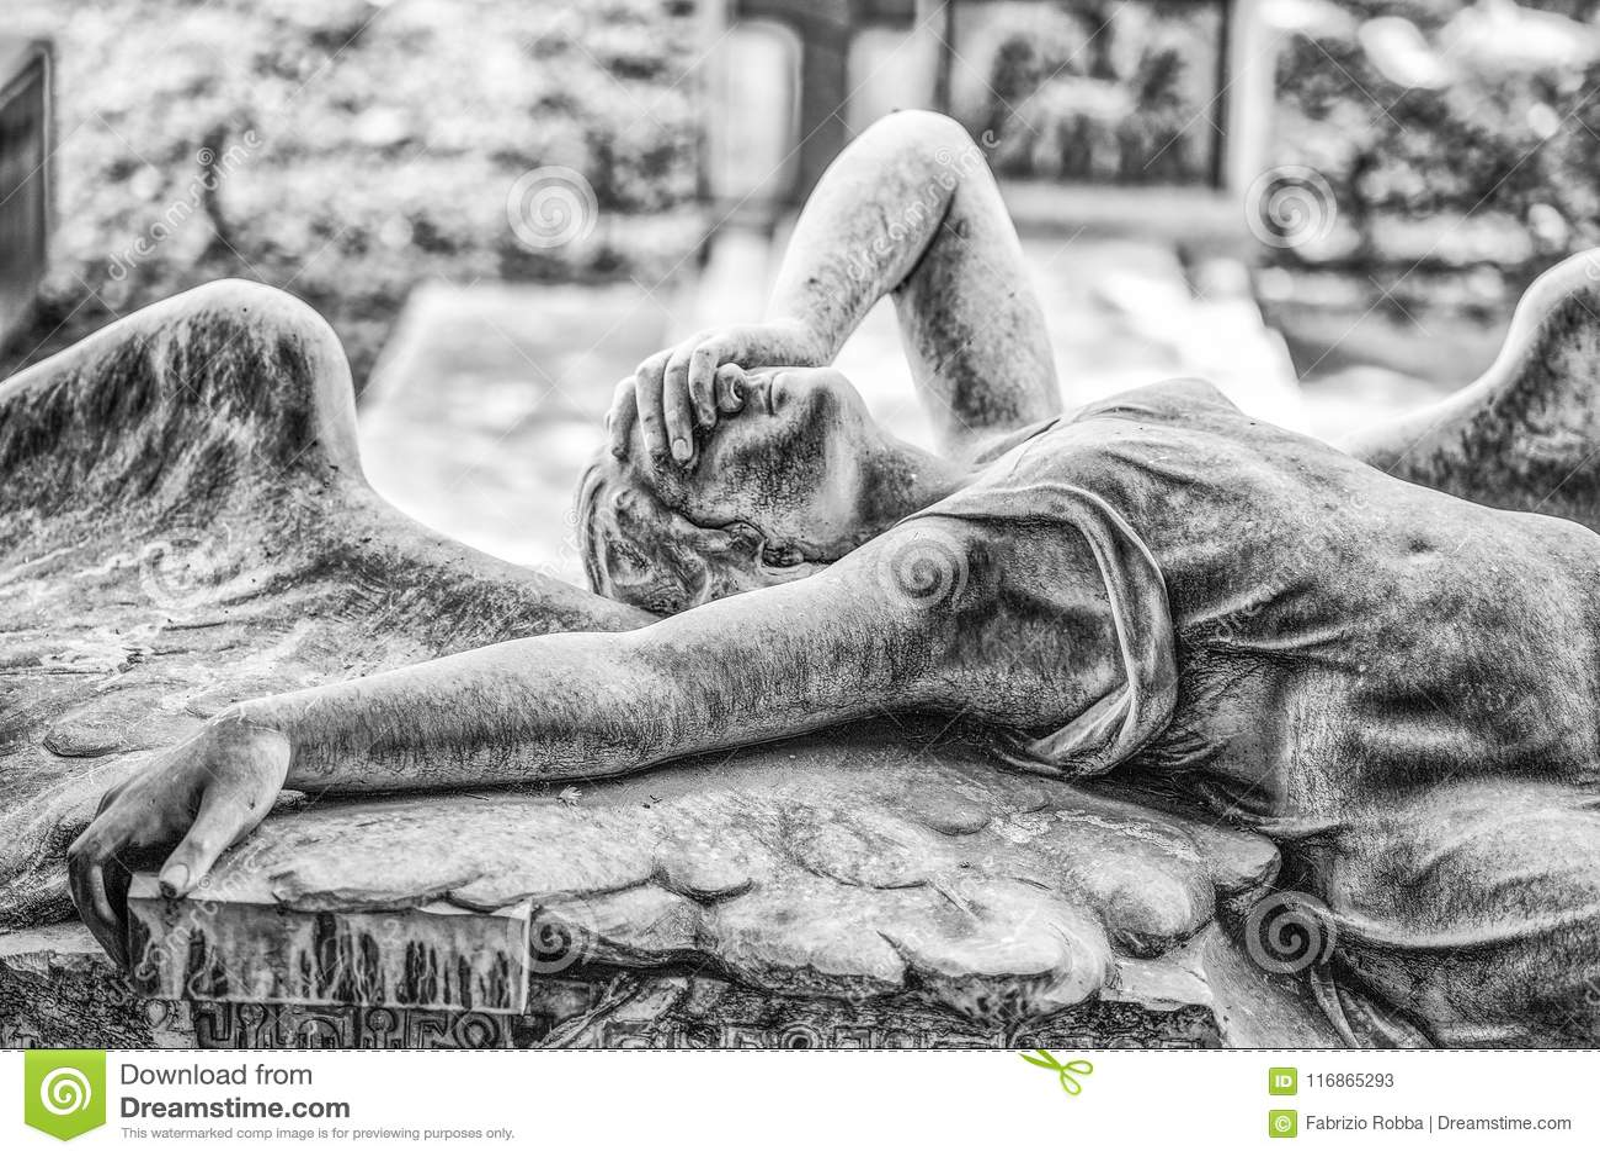 Ribaudo家庭的坟茔,热那亚,意大利巨大的公墓,著名为盖子唯一英国带喜悦Divisi